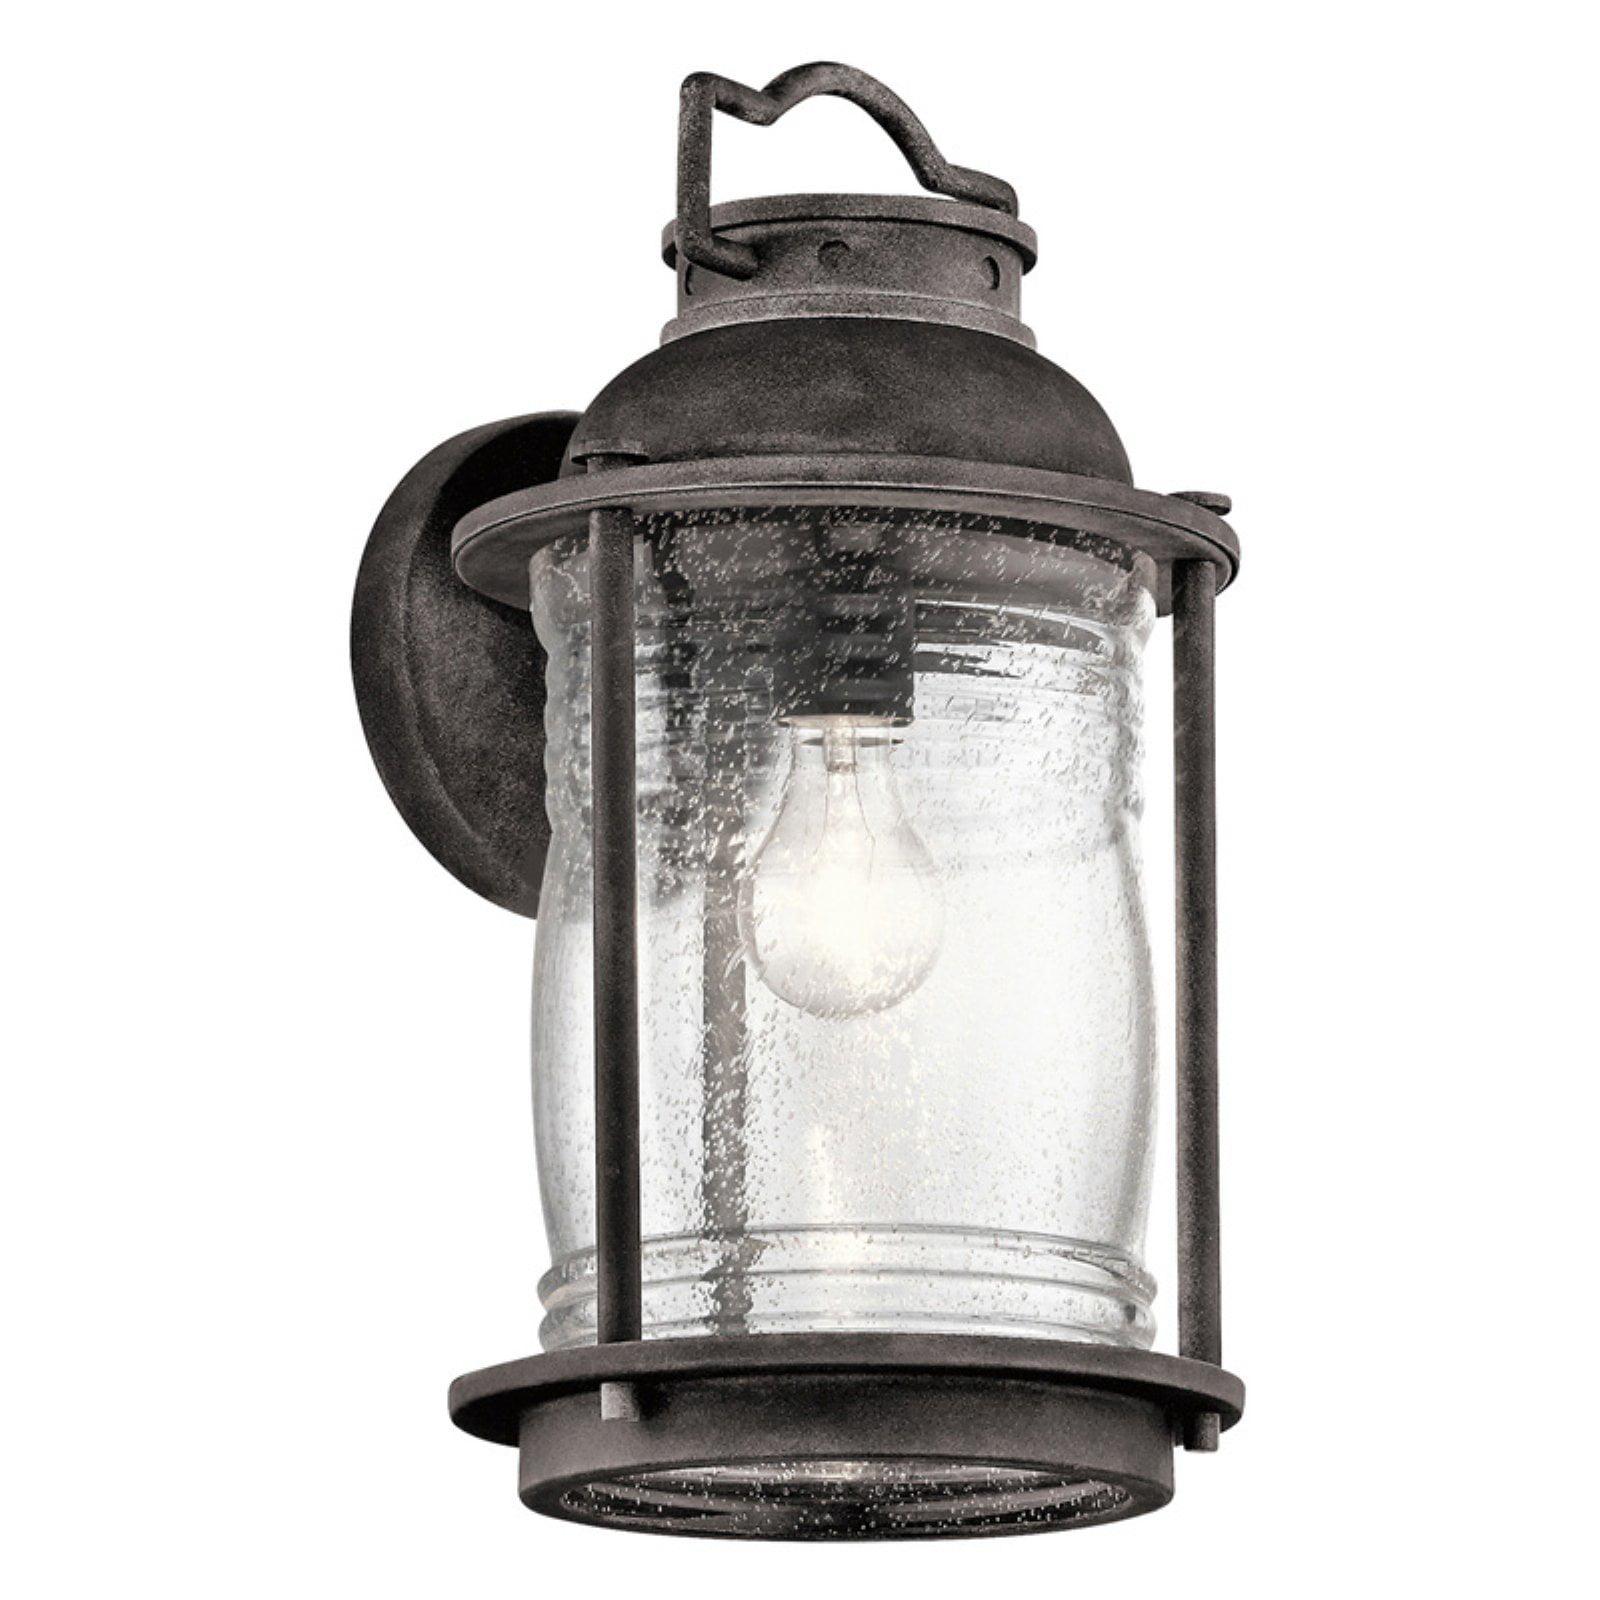 Kichler Ashland Bay 49571WZC Outdoor Wall Light